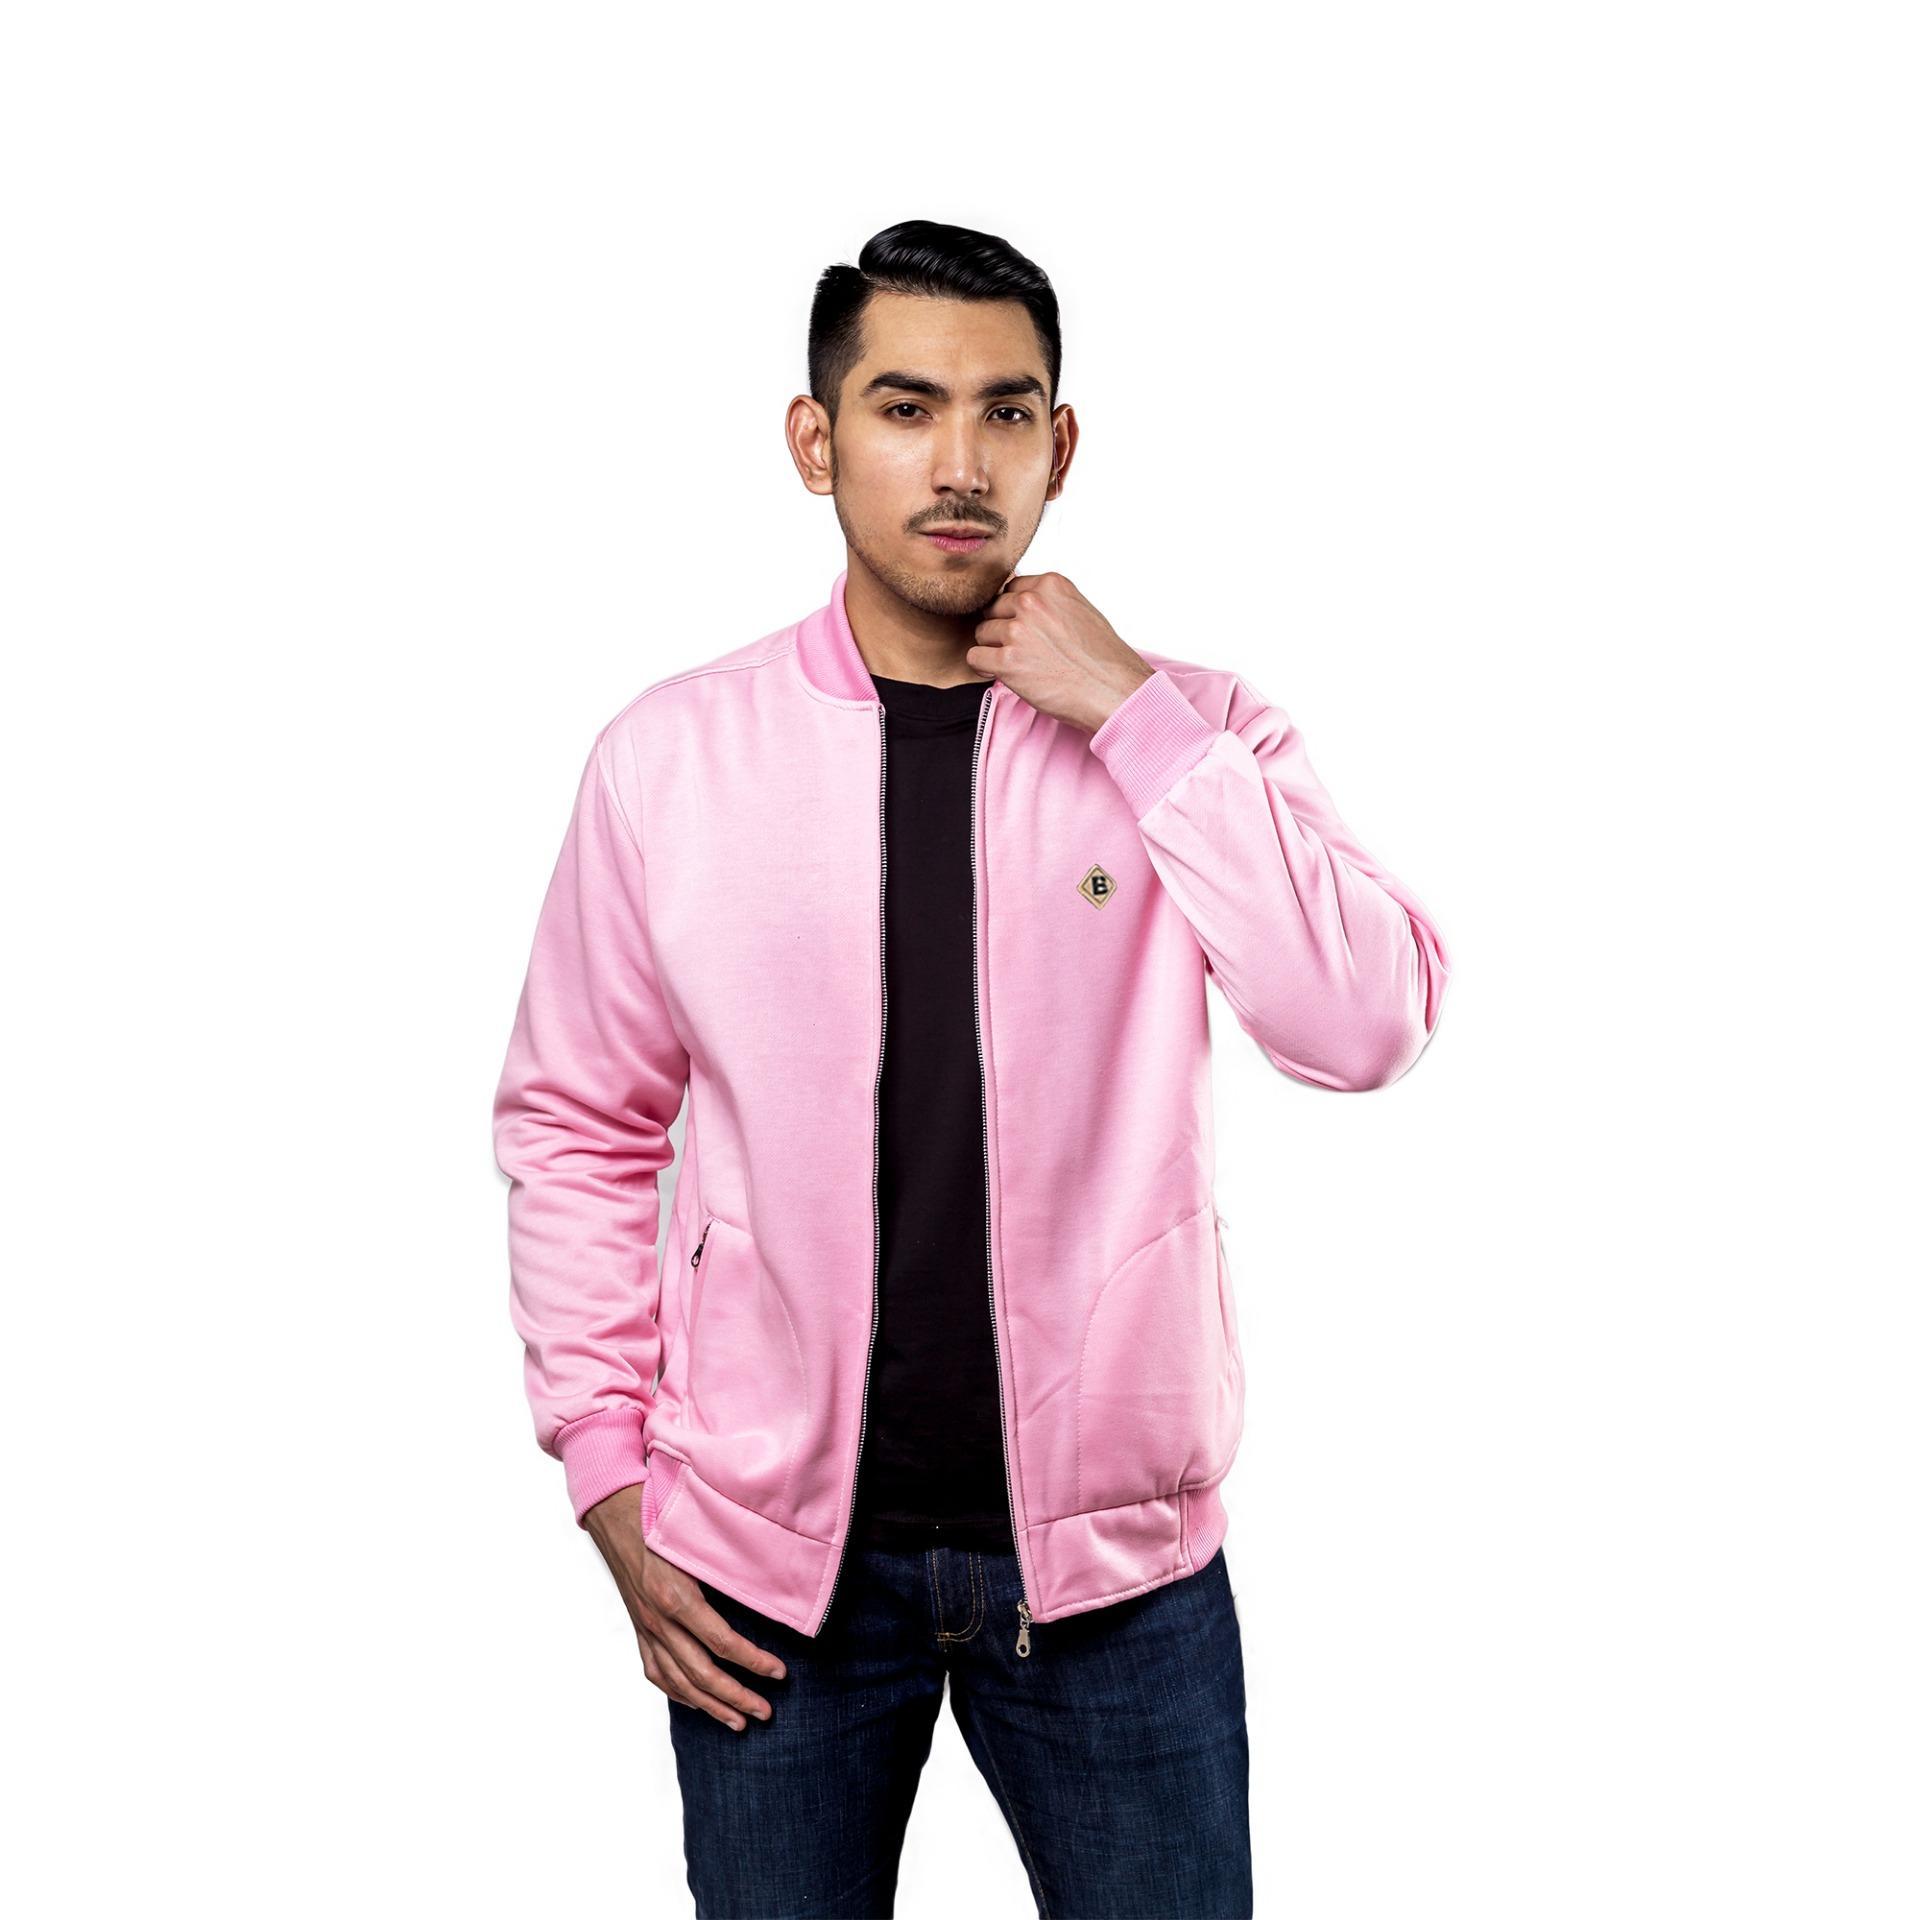 Kelebihan Bajukitaindonesia Jaket Bomber Polos Maroon M Xl Pria Dan Wanita Pinkbaby